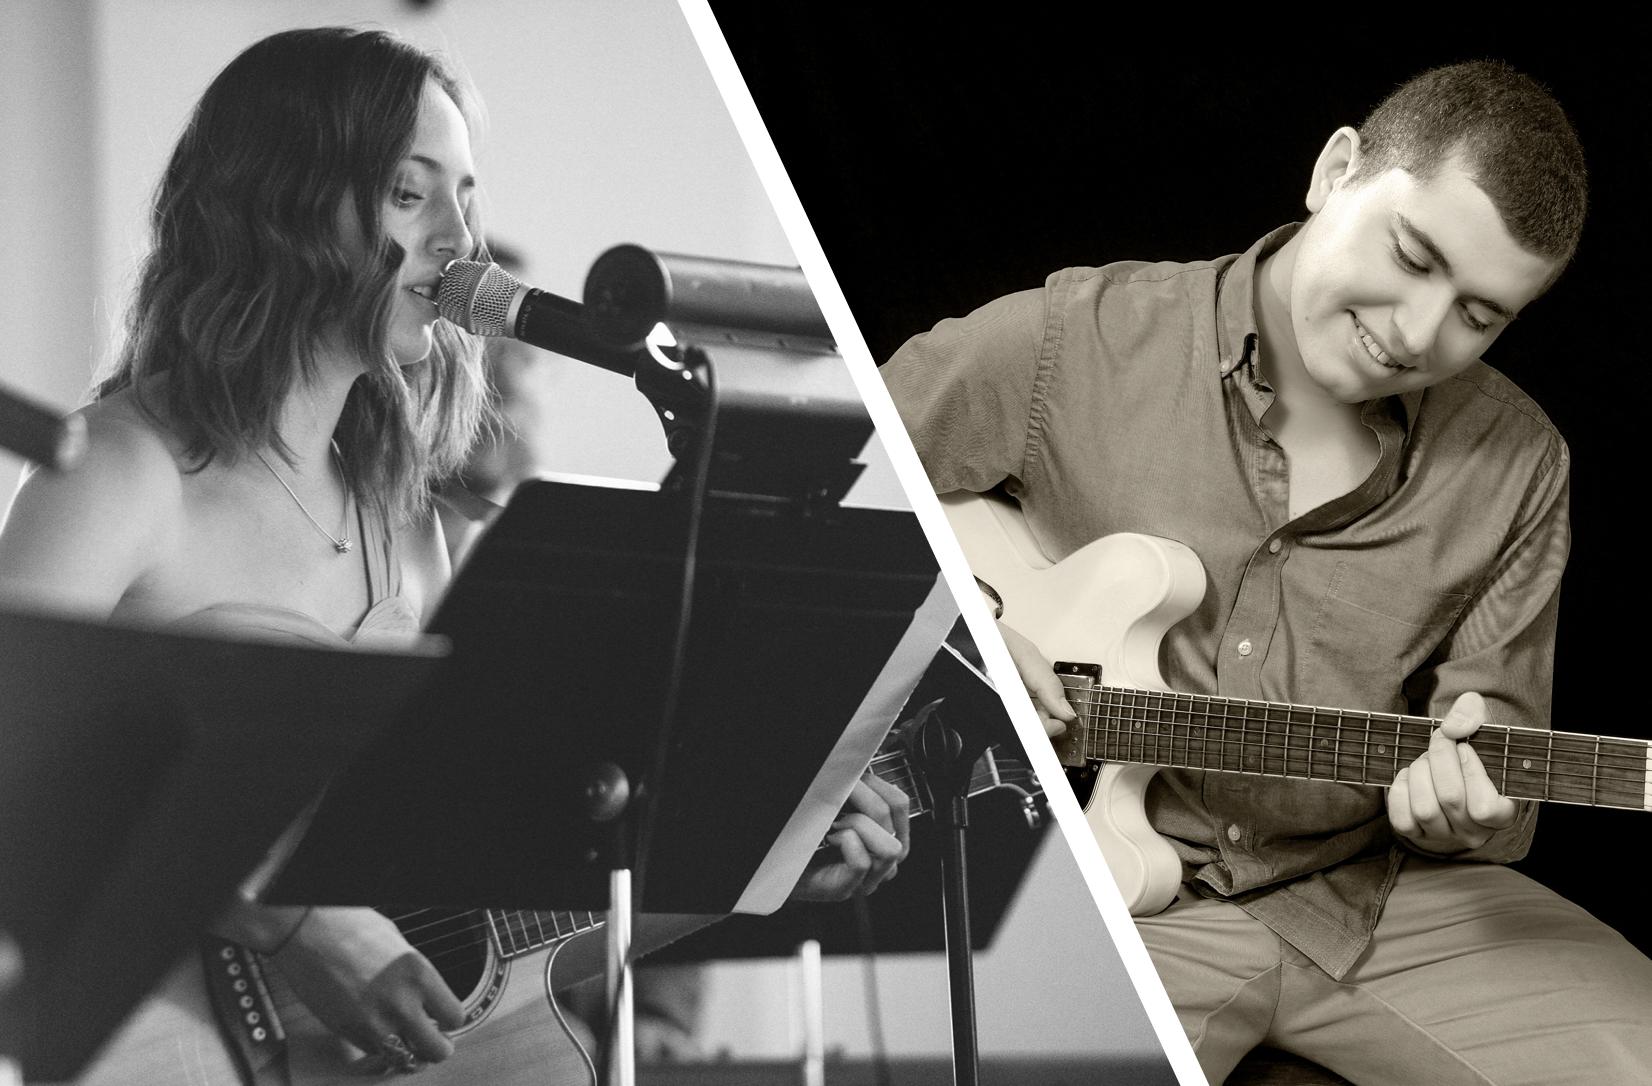 Live Music: Austin Stahle & Sarah Wilcox at Blend 111